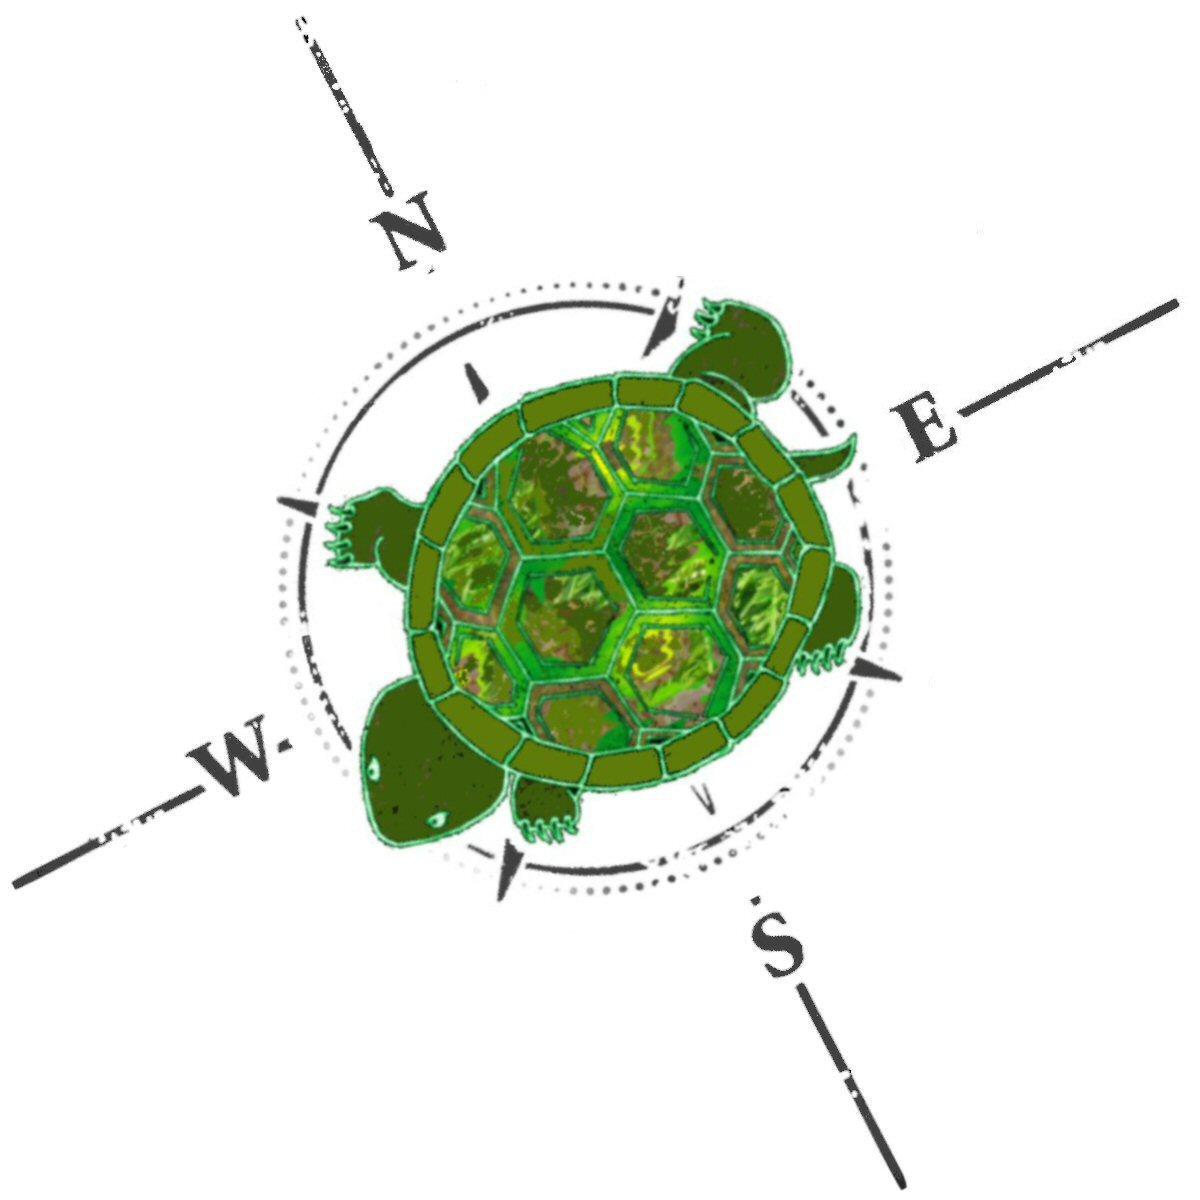 TurtleHerding